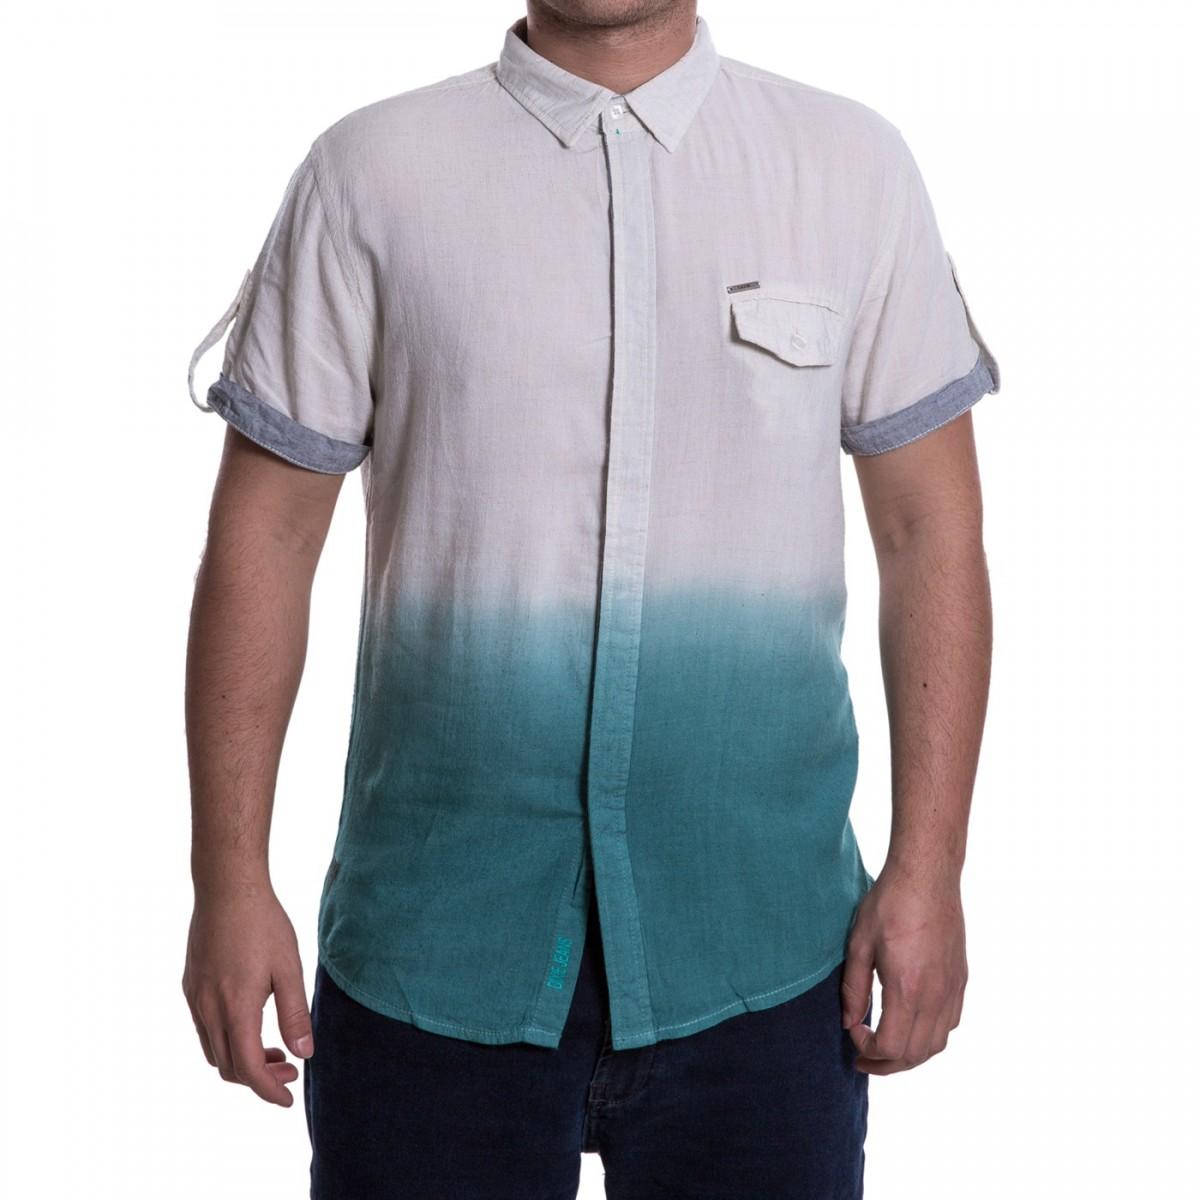 Bizz Store - Camisa Social Masculina Dixie Manga Curta Degradê 44c896ec4a814